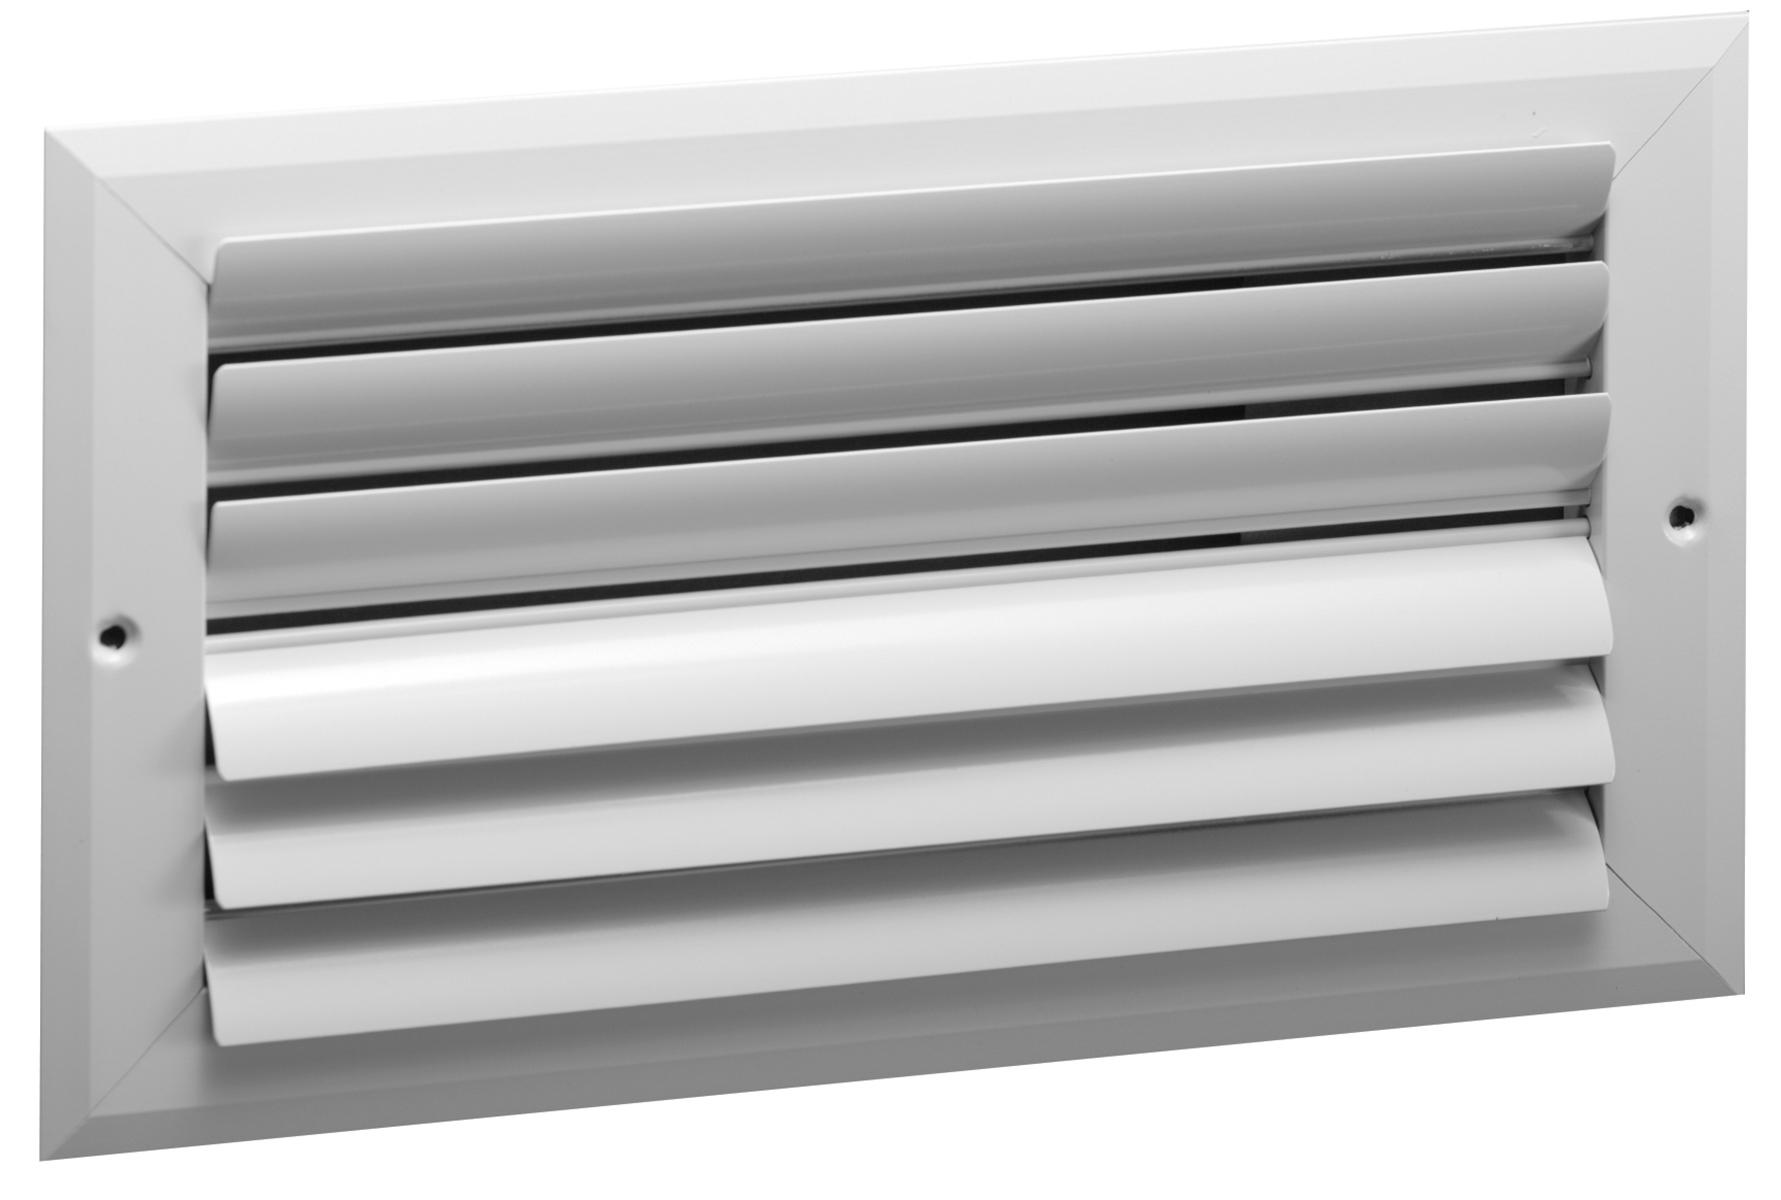 Ch2 Aluminum Curved Blade 2 Way Register No Damper